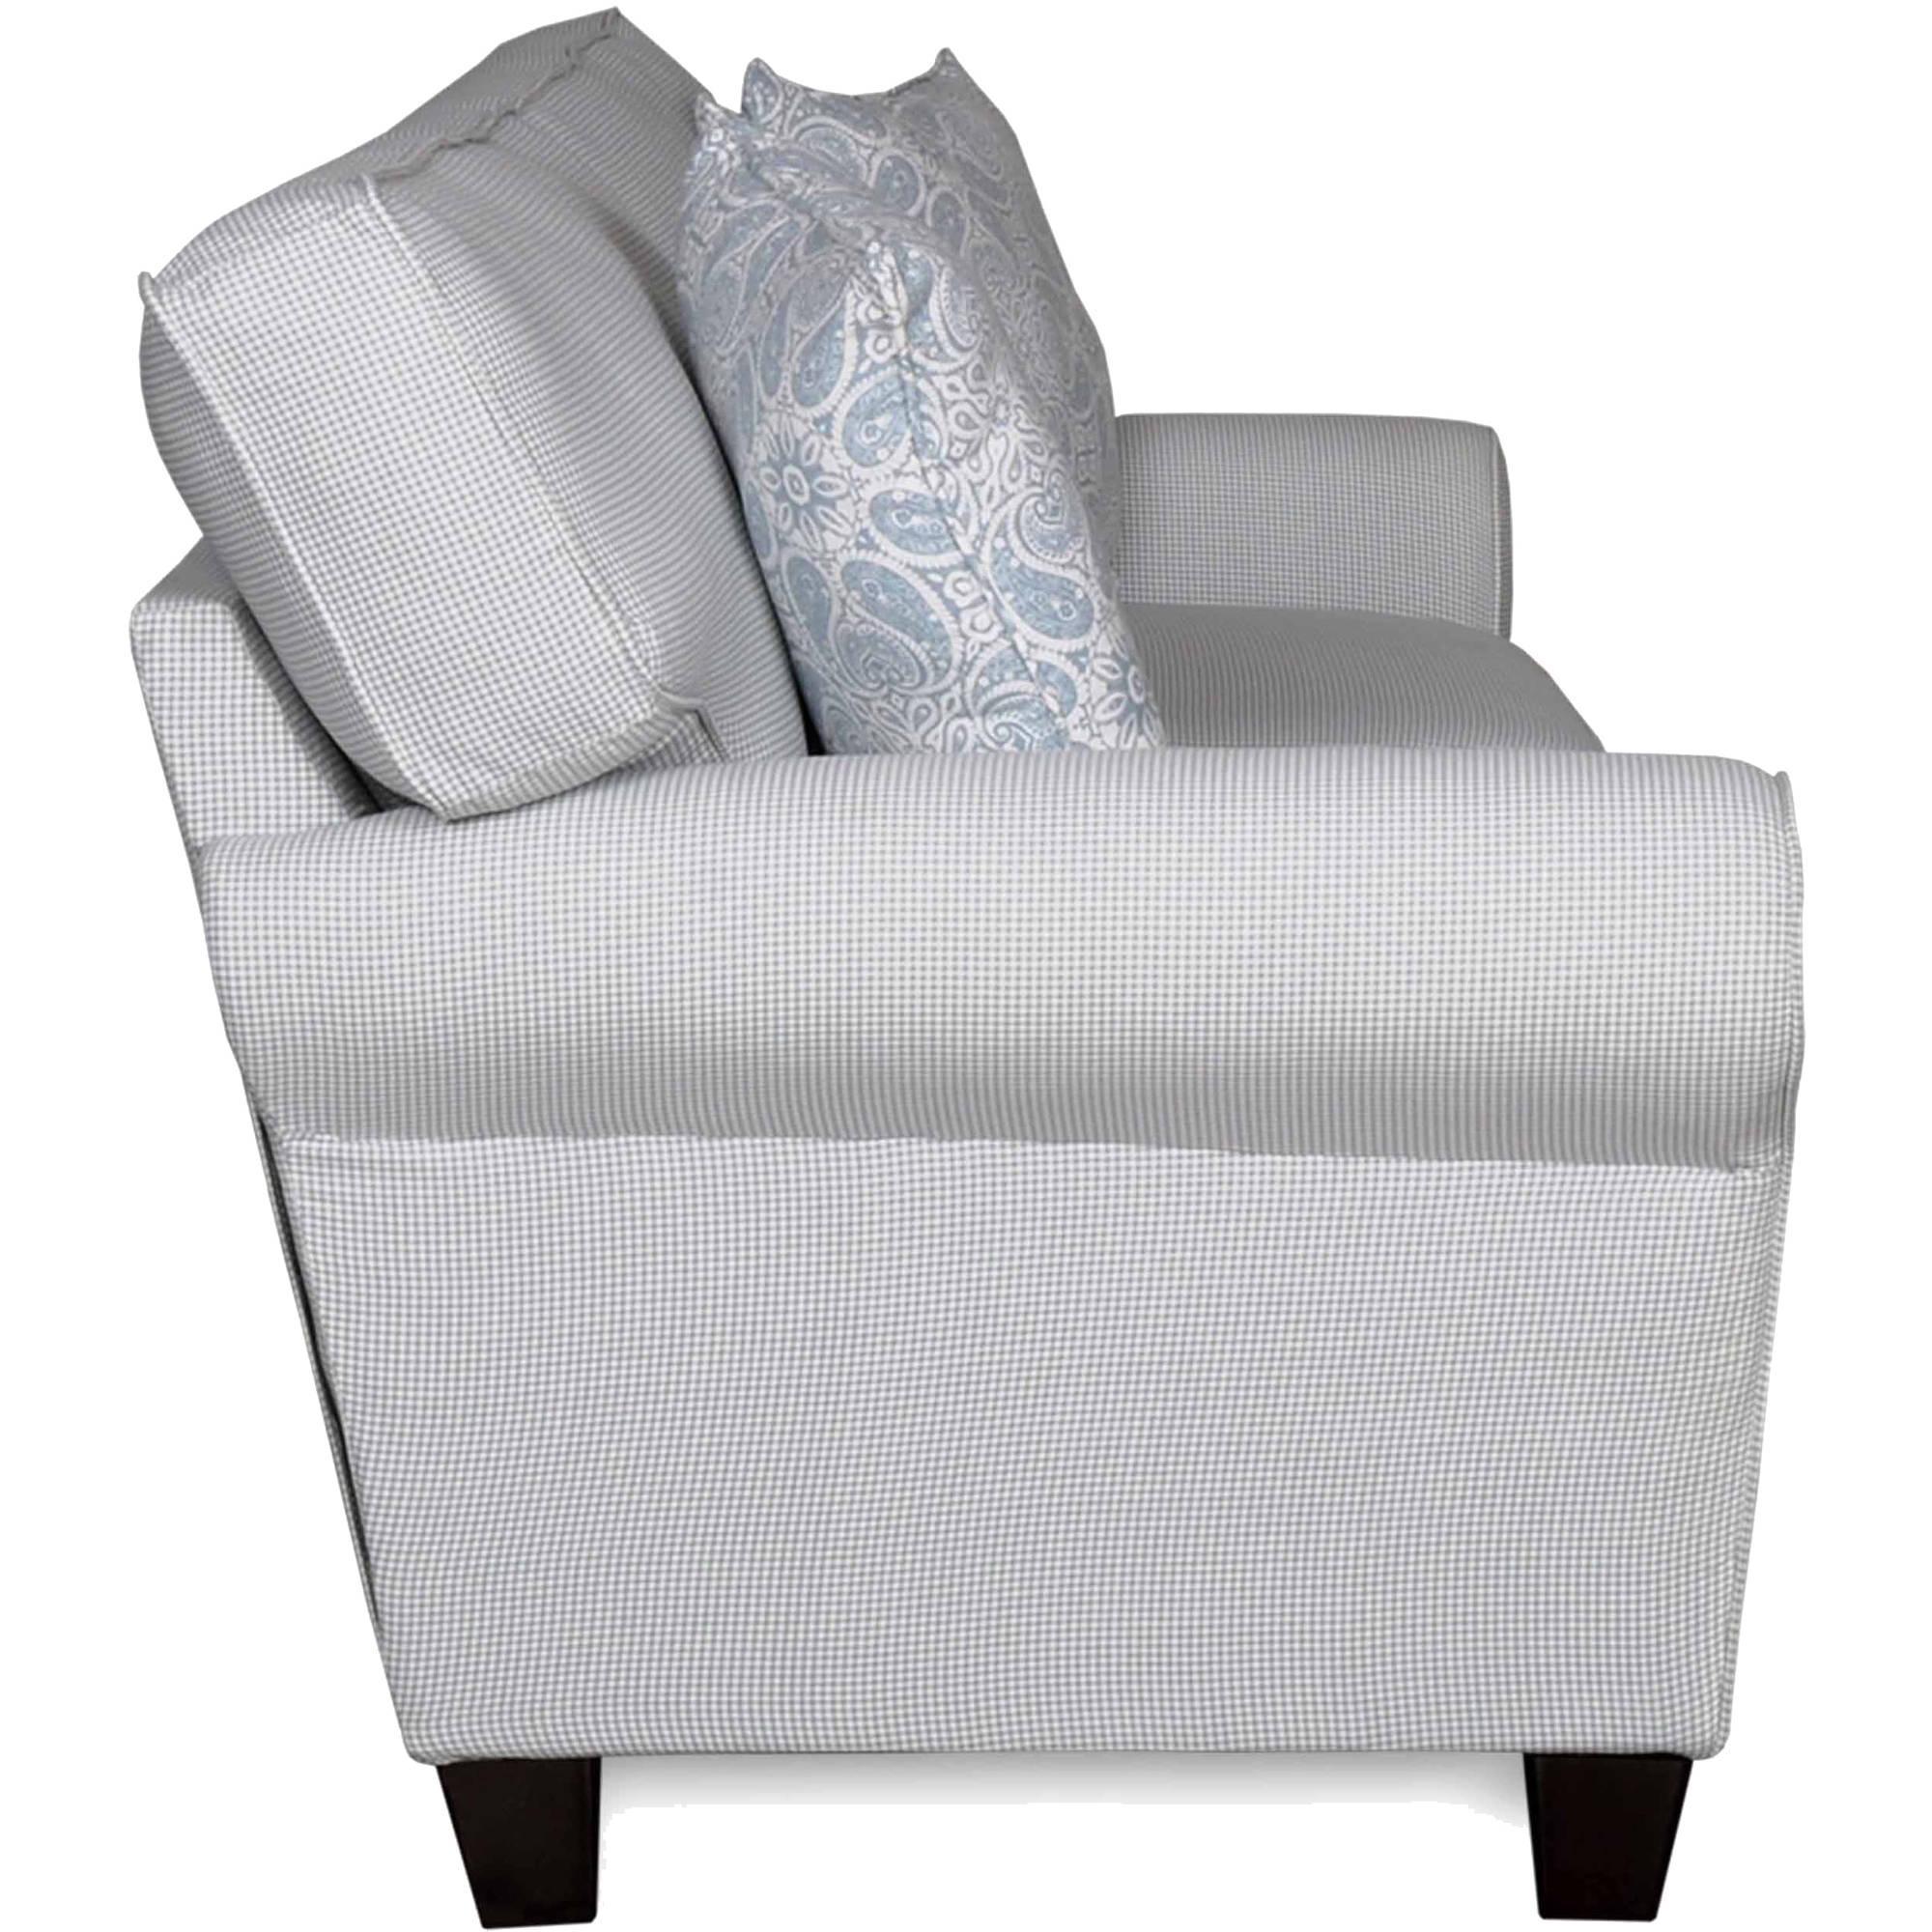 Gingham Sofa Within Gingham Sofas (Image 17 of 20)